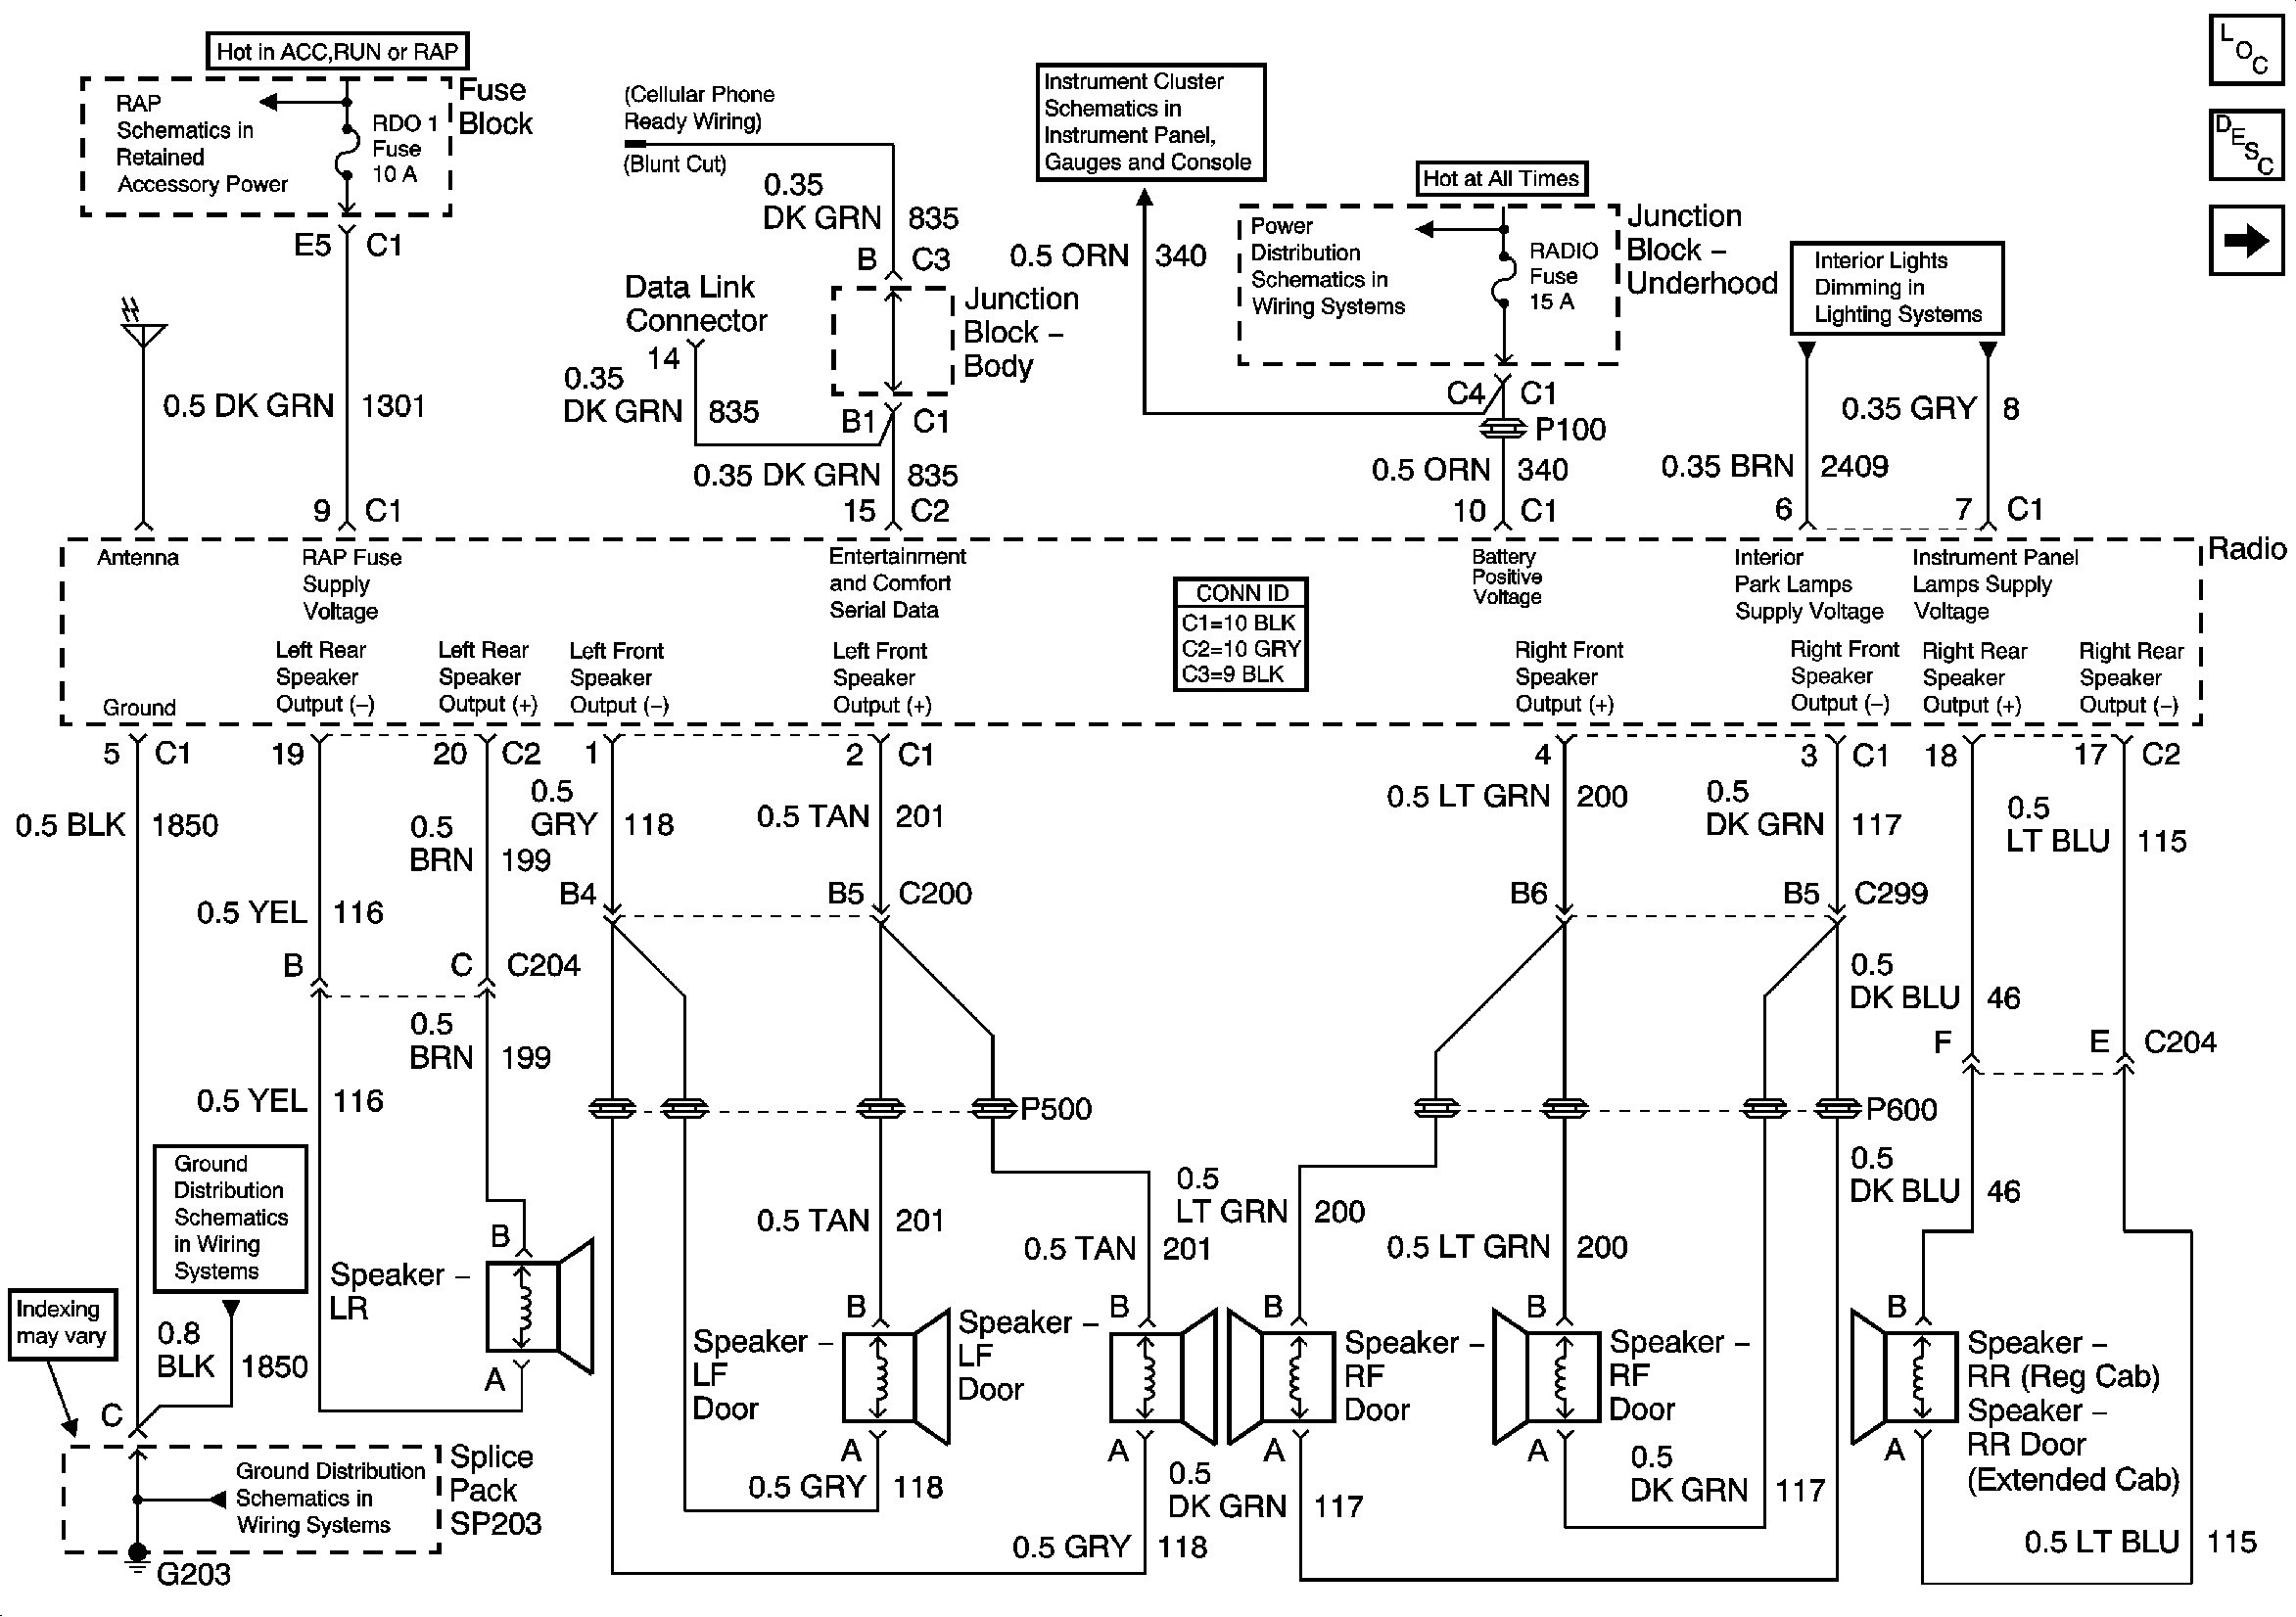 2003 Chevy Silverado Engine Diagram 2004 Chevy Silverado Engine Wiring Harness Wiring Diagram toolbox Of 2003 Chevy Silverado Engine Diagram